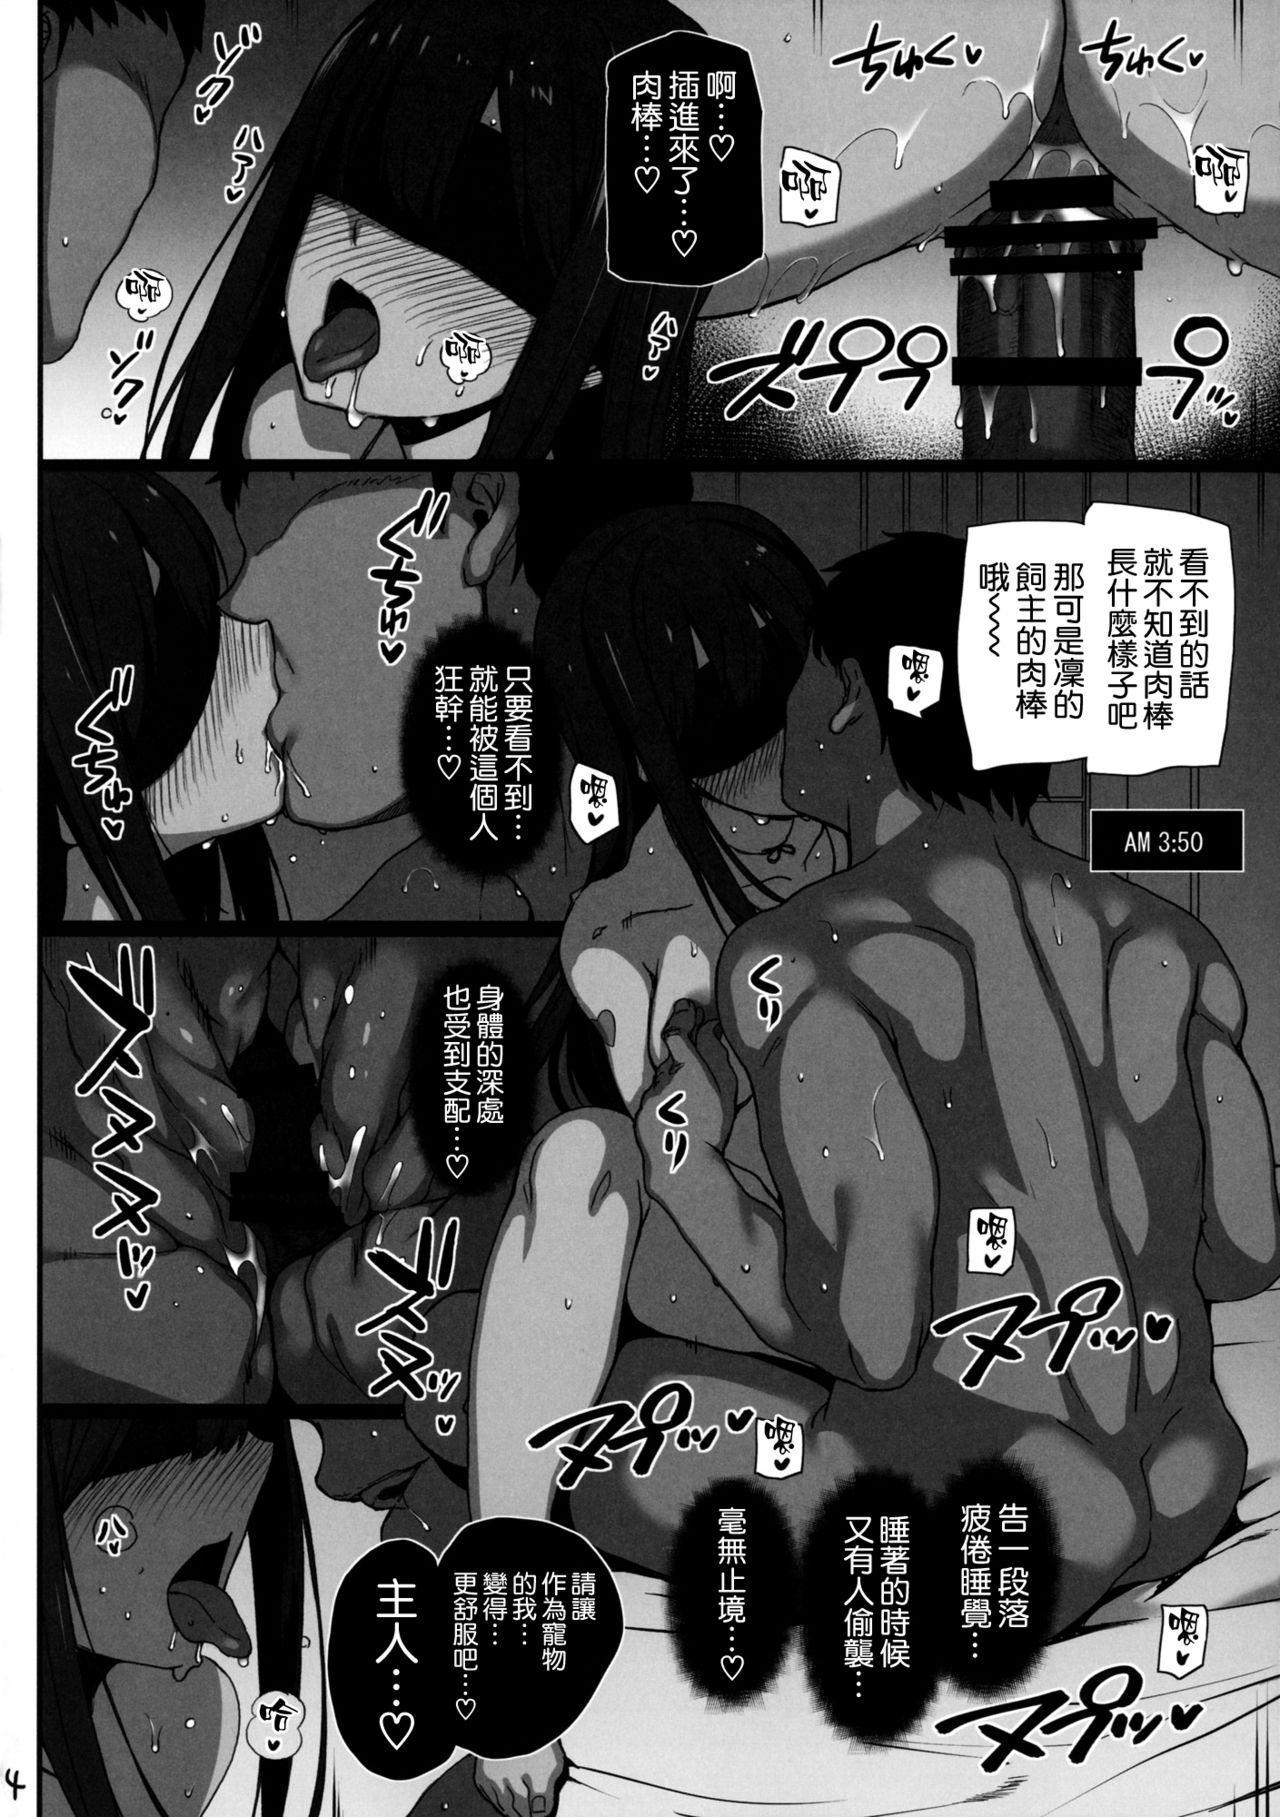 (C92) [Basutei Shower (Katsurai Yoshiaki)] Inran NUDIE TRIP ~sex harem 02~ + Omake Clear File (THE IDOLM@STER CINDERELLA GIRLS) [Chinese] [空気系☆漢化] 45